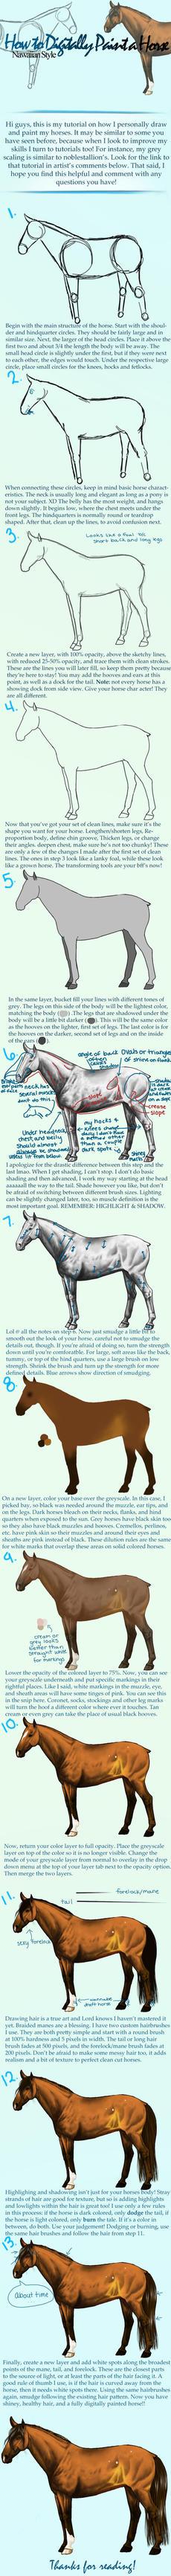 Digital Horse Painting Tutorial by Nawaii